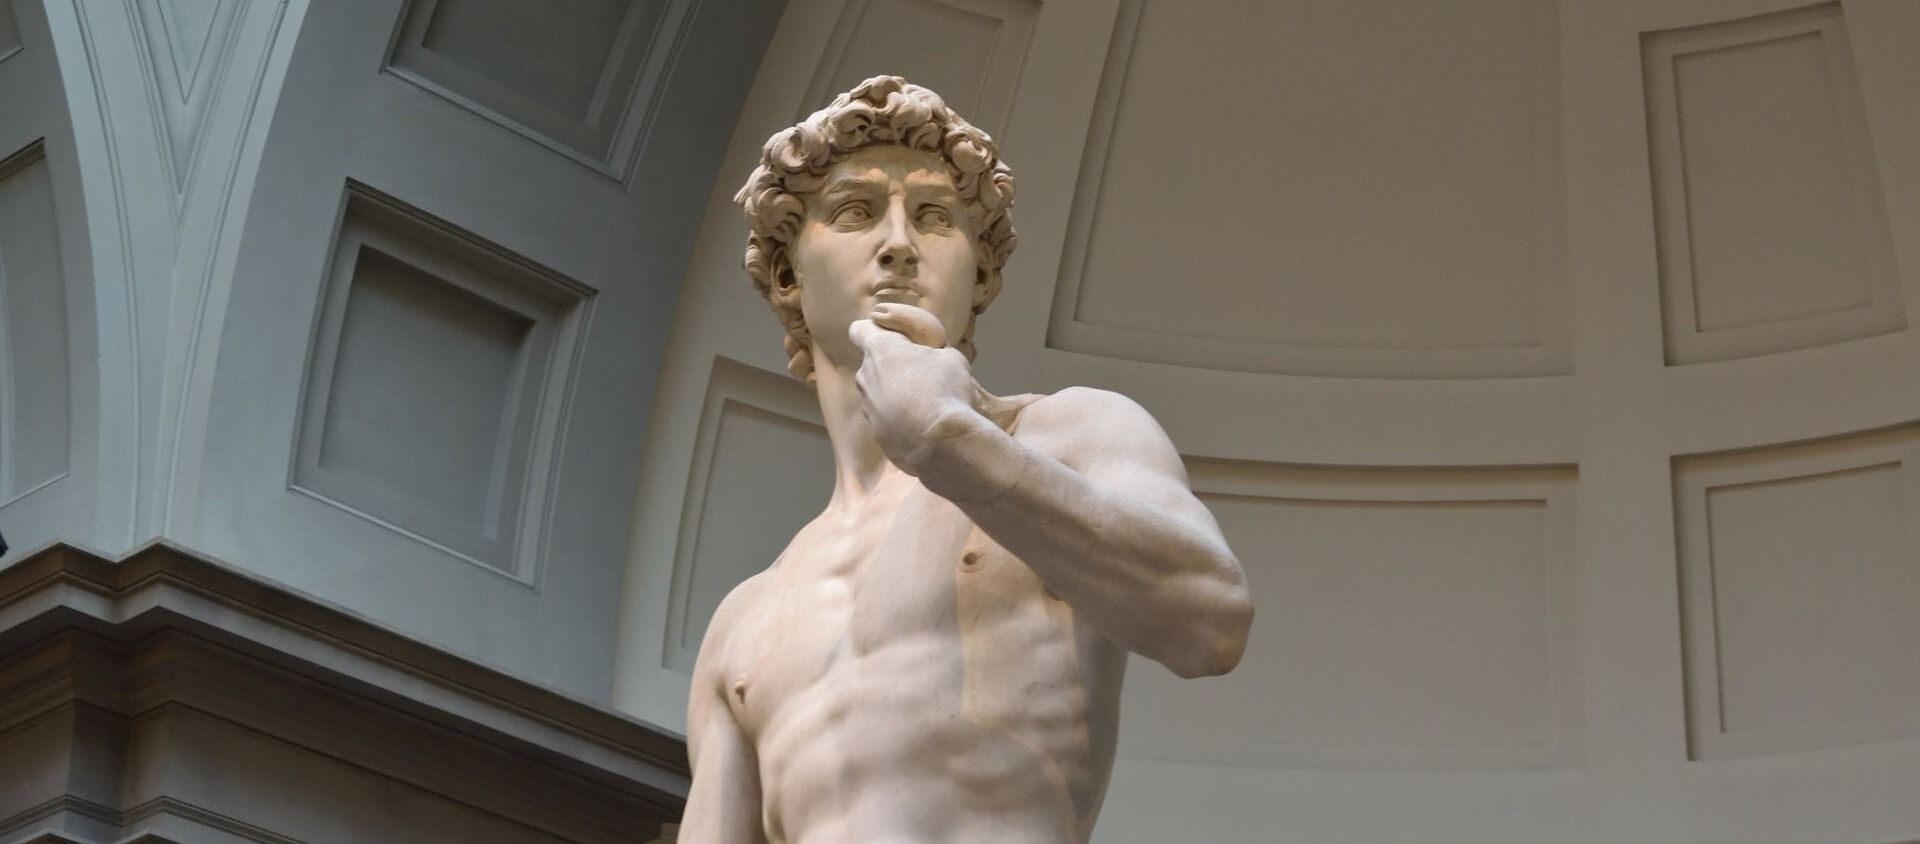 La escultura de David de Miguel Ángel - Sputnik Mundo, 1920, 14.04.2020